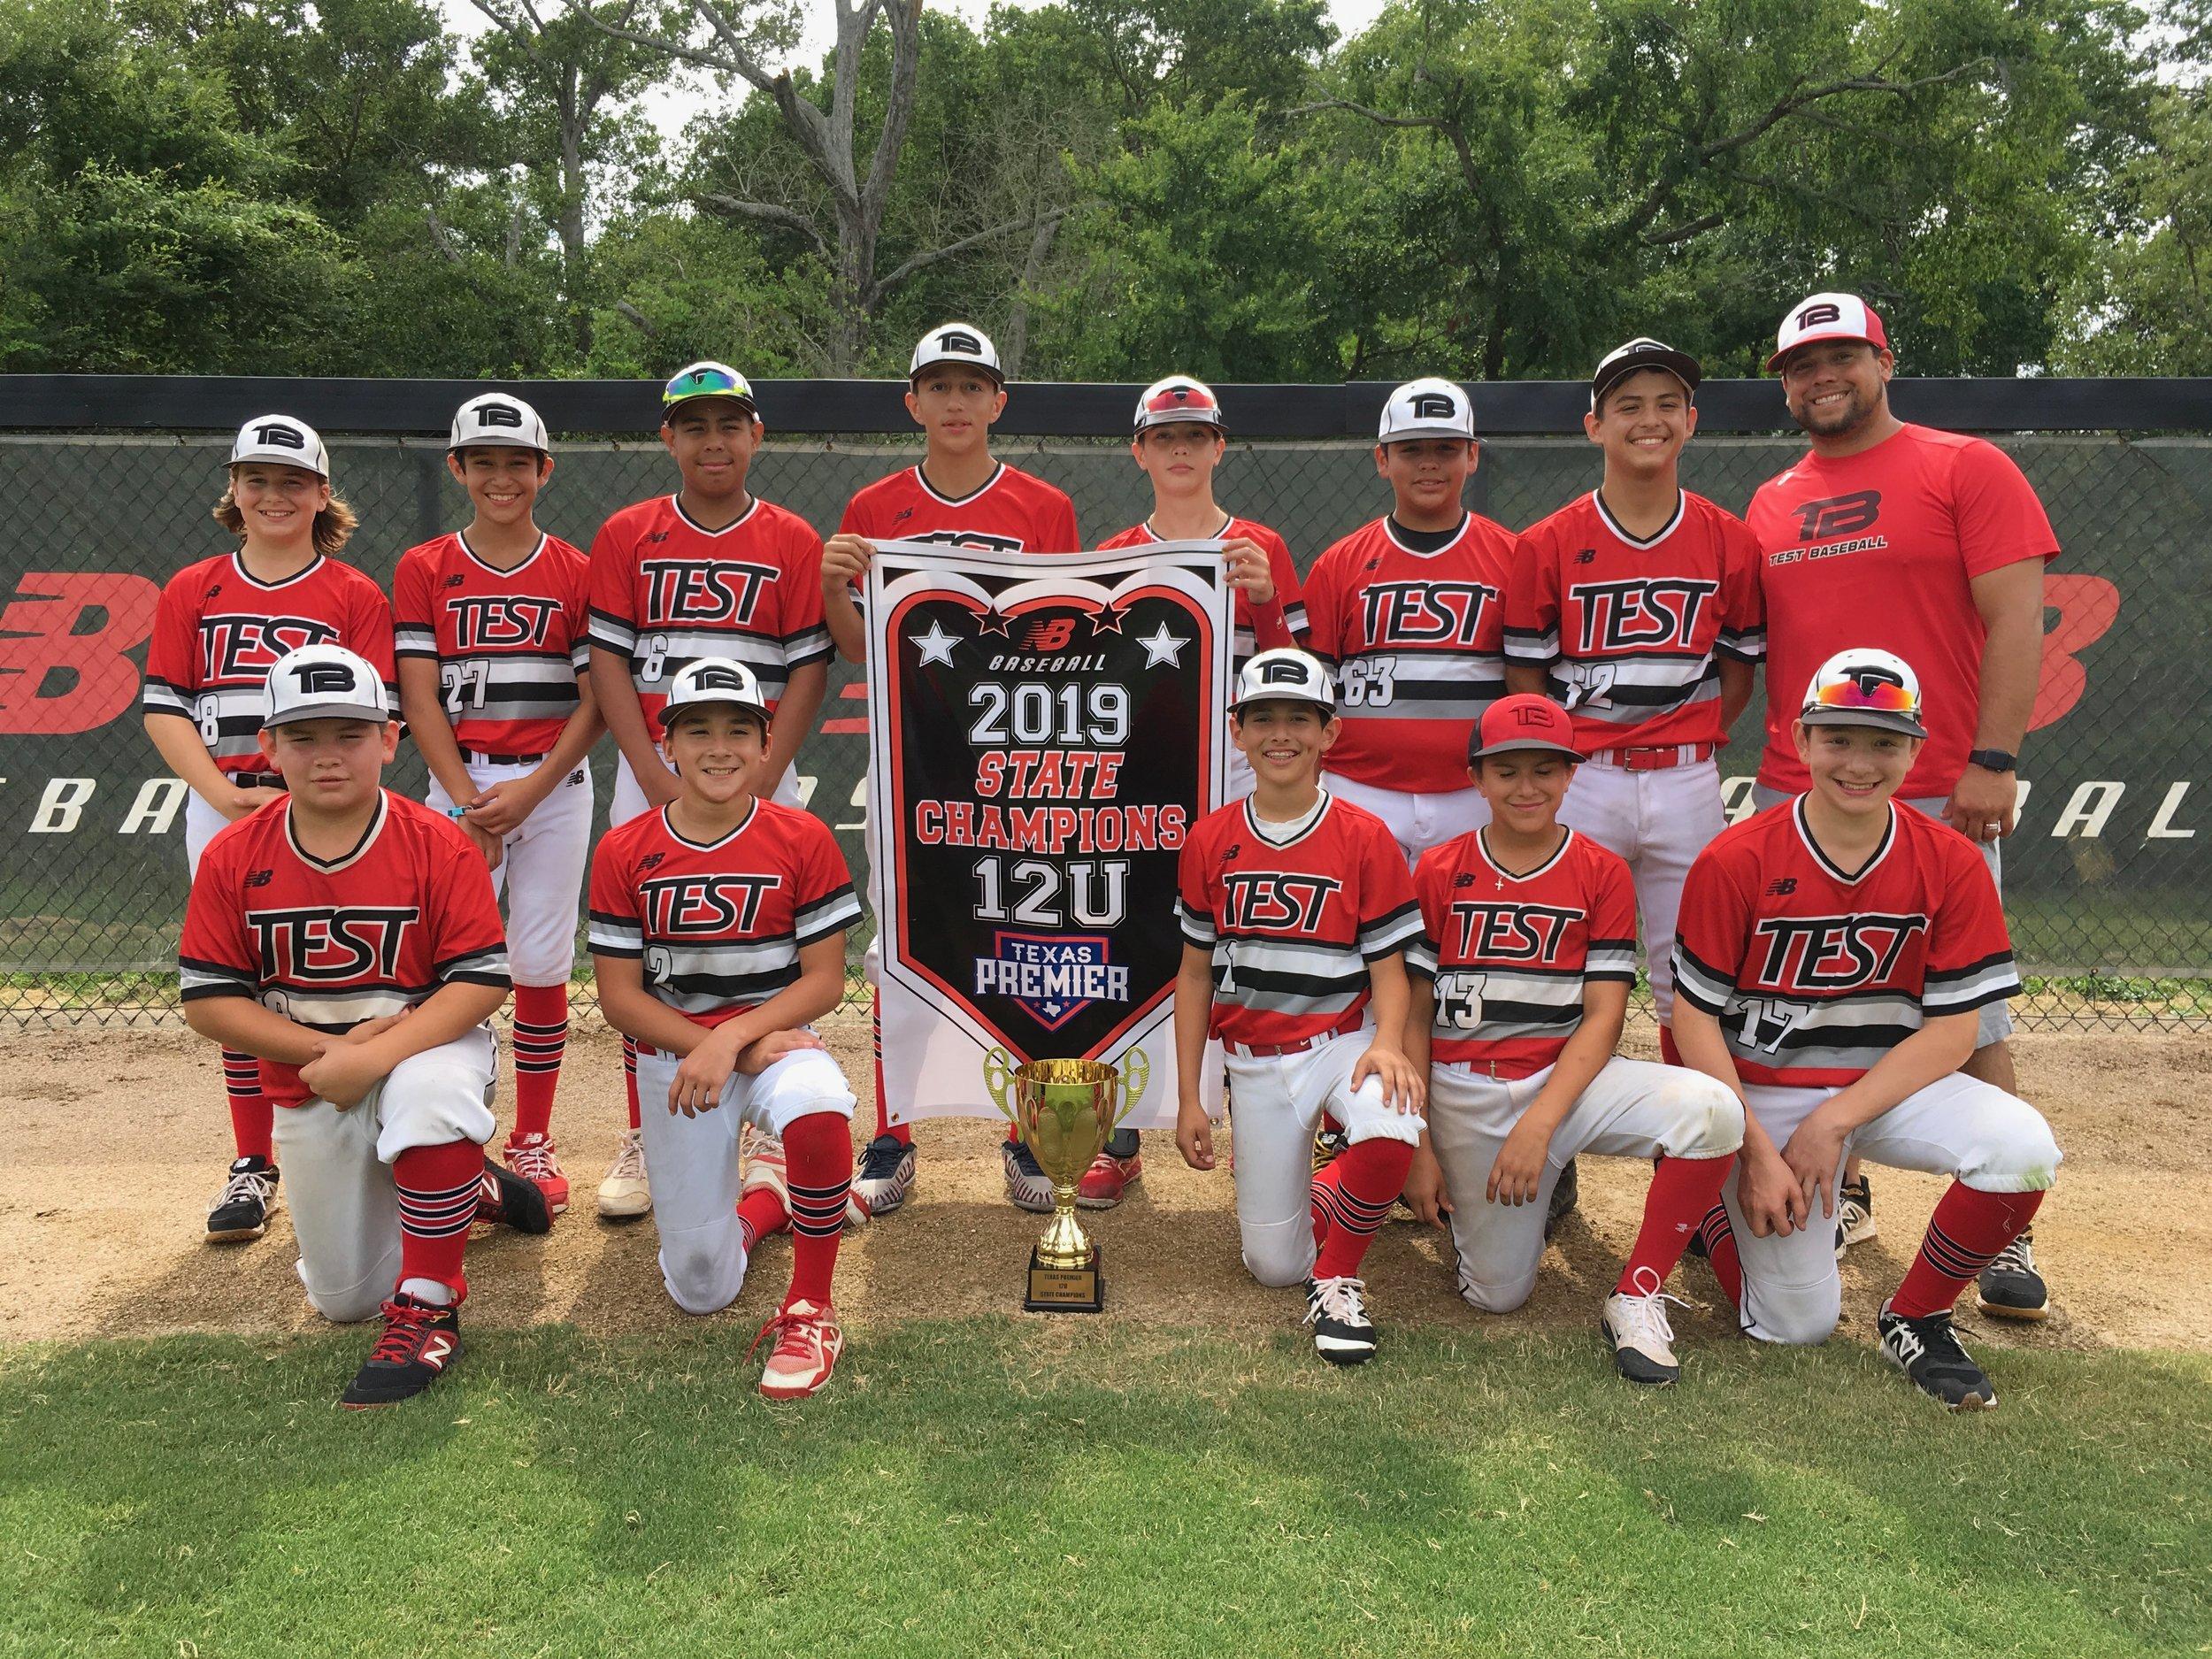 12u State Championship (June 14-16) — Texas Premier Baseball